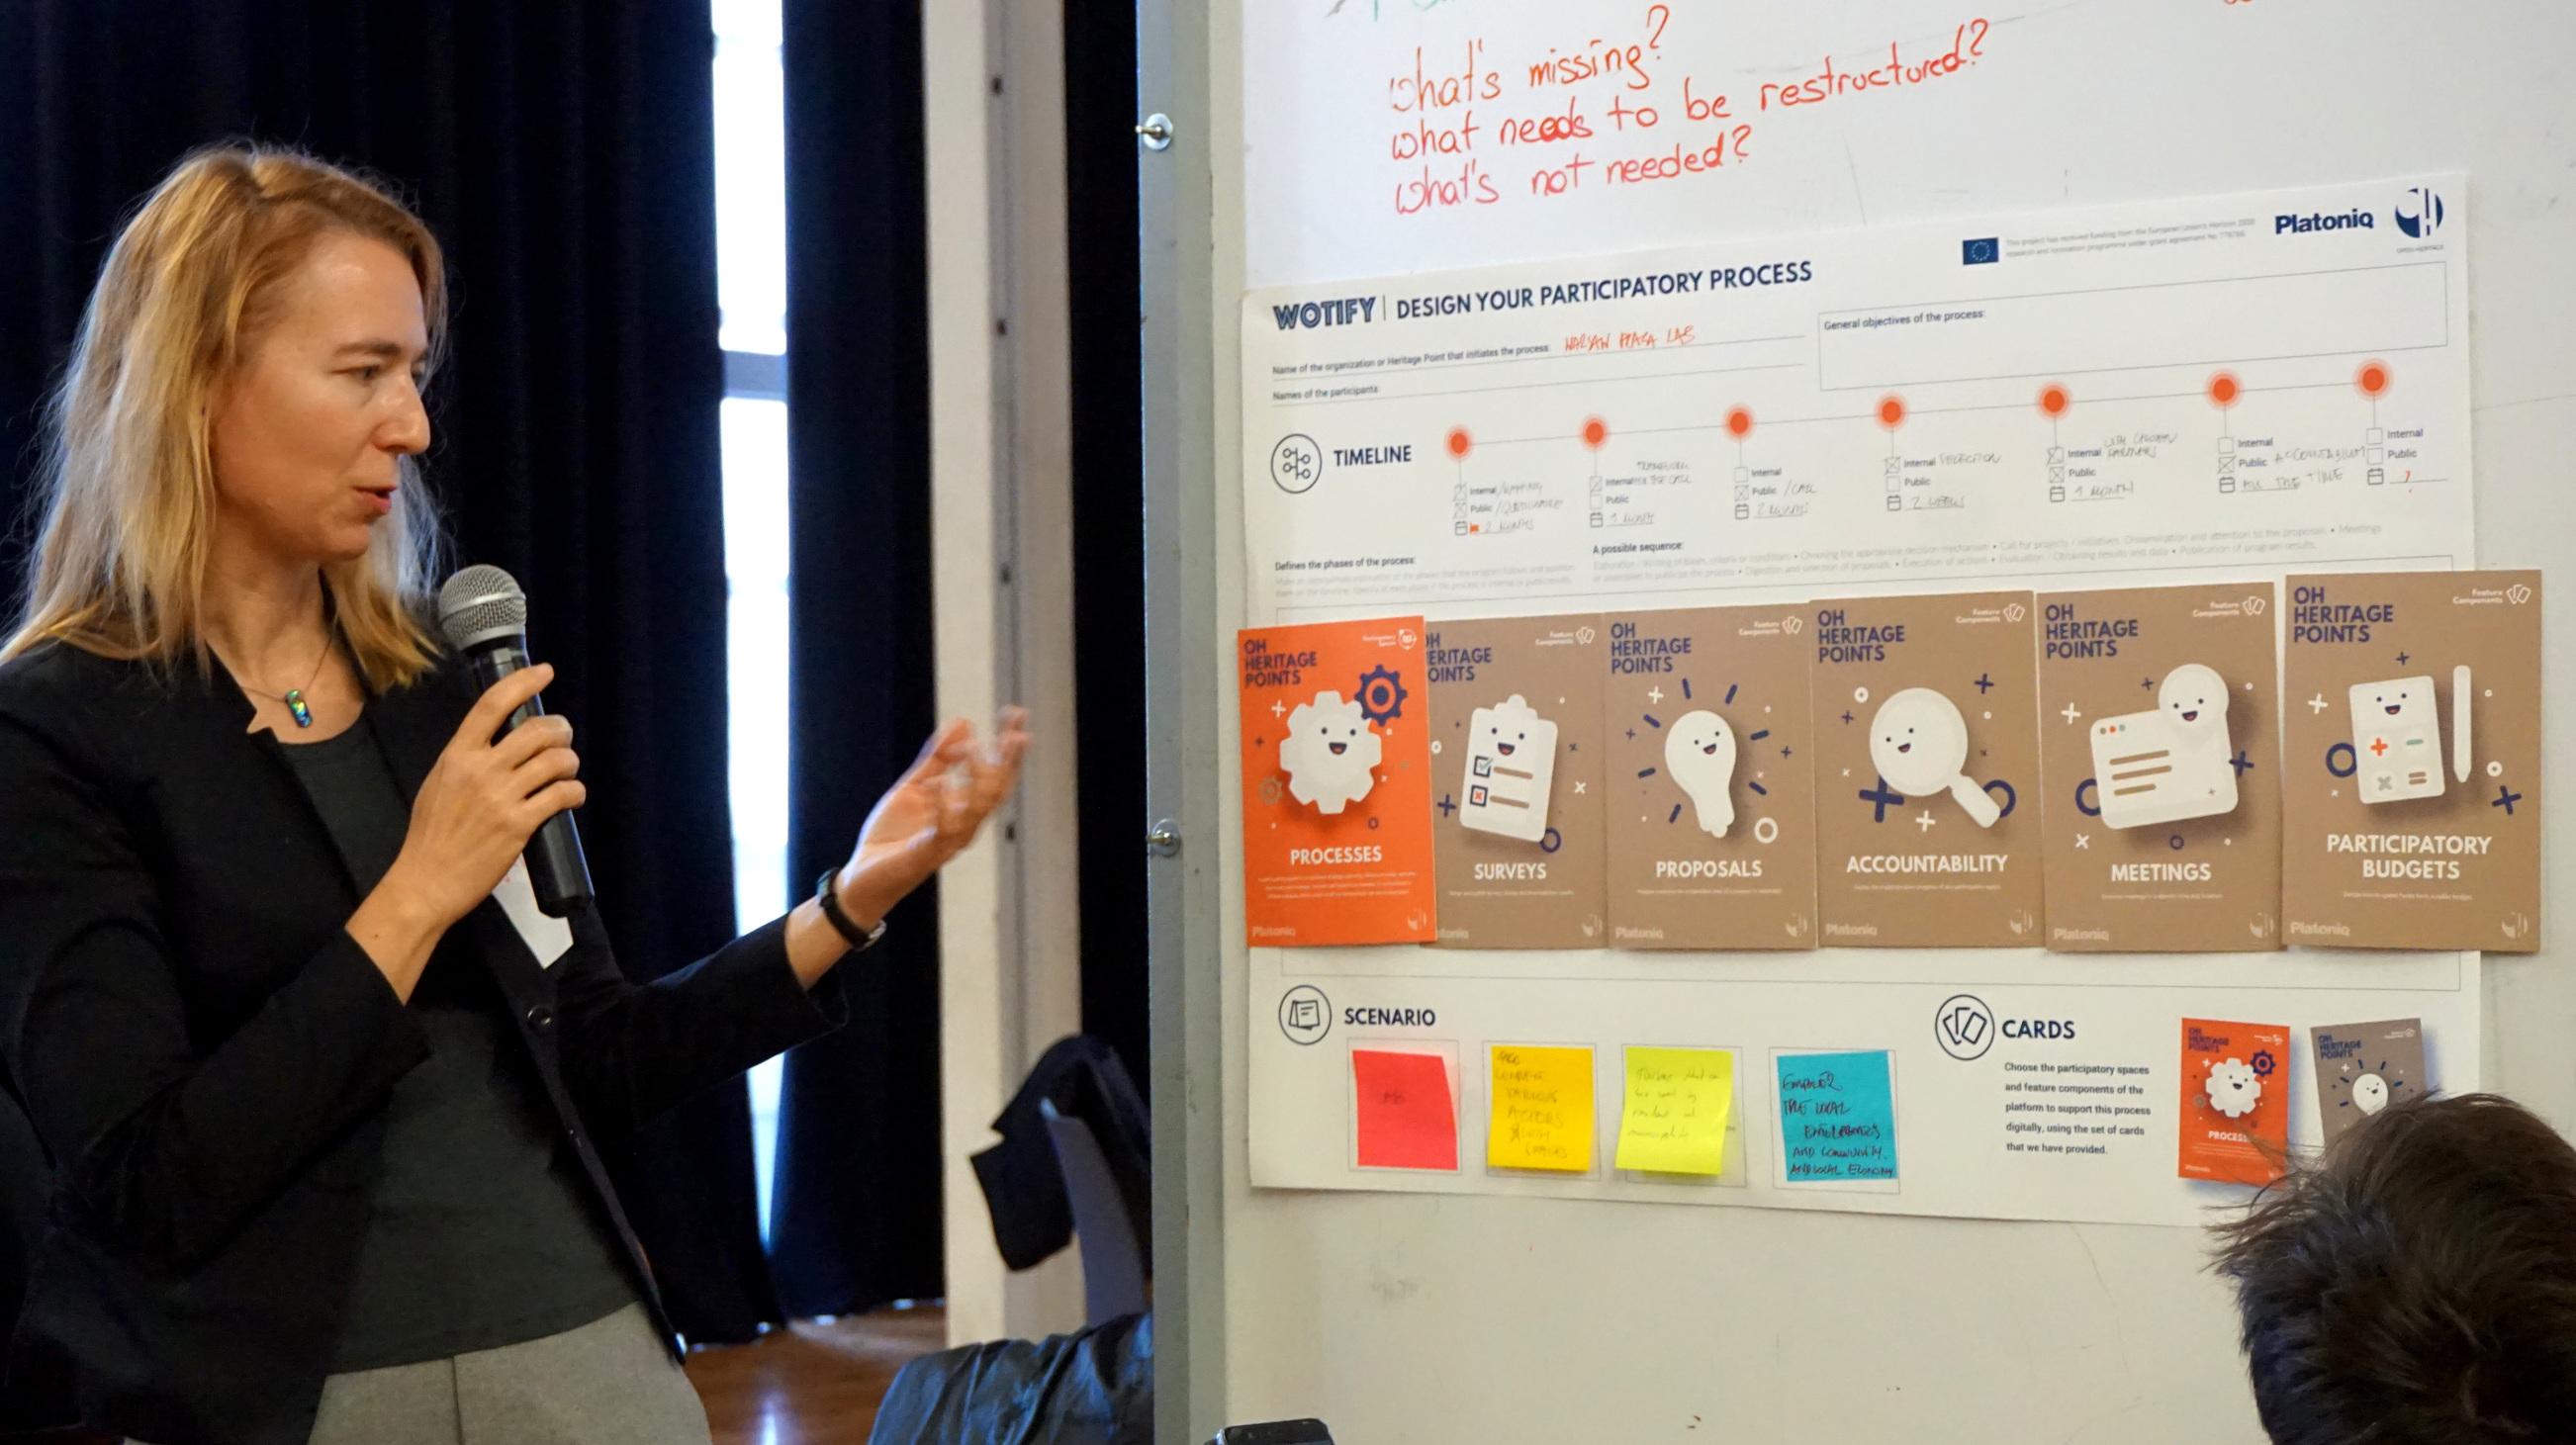 http://public.platoniq.net/openheritage/barcelona-meeting/warsaw%20presentation.resized.jpg